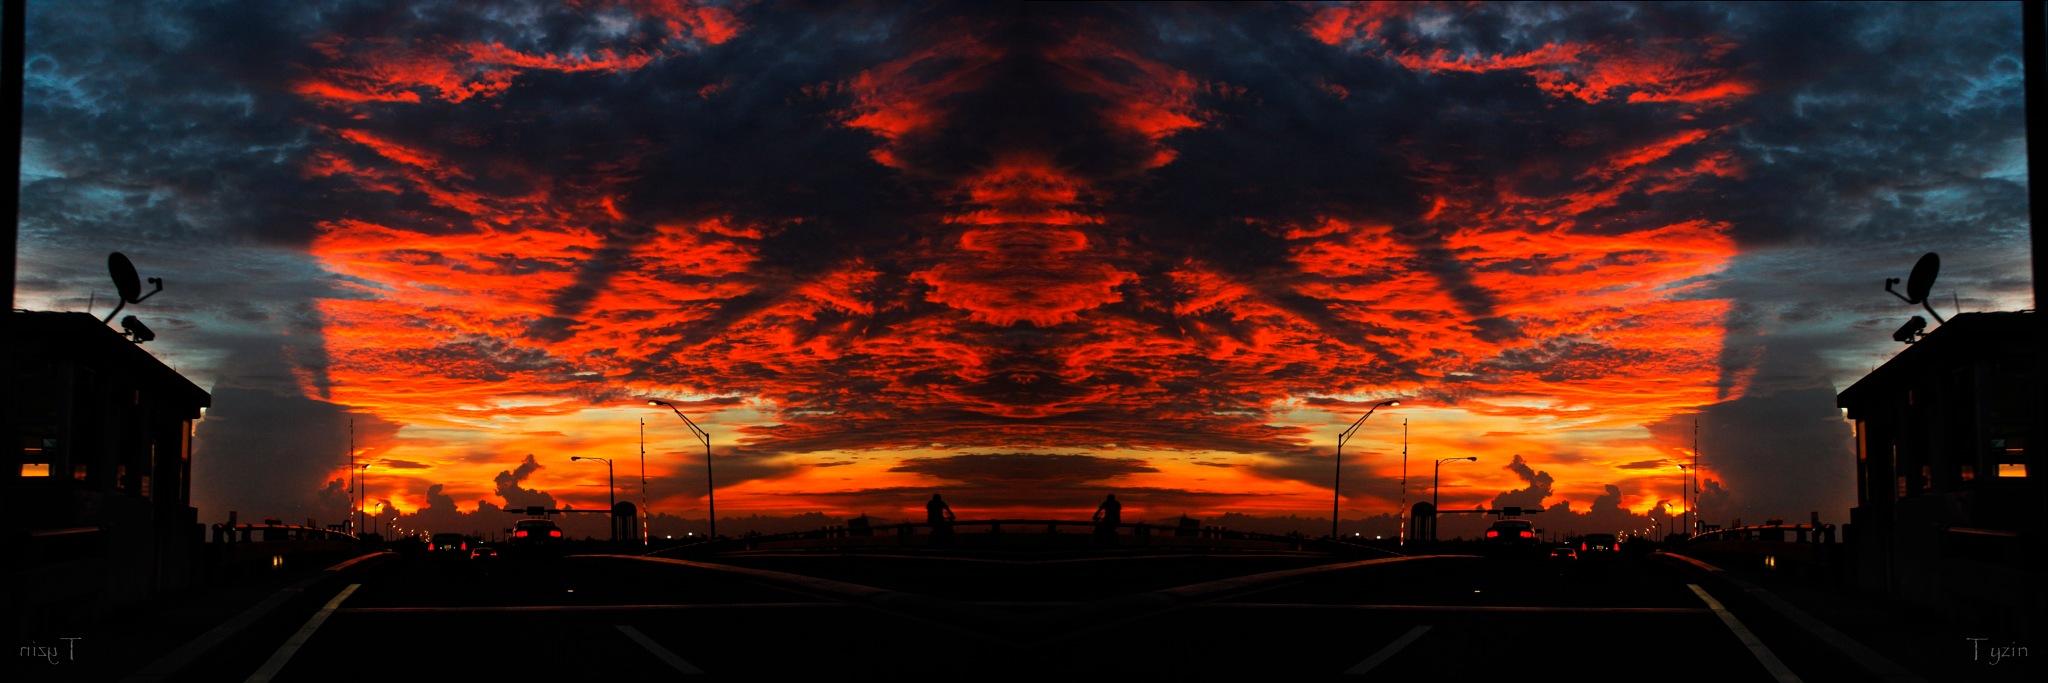 Mirrored  by Tyzin